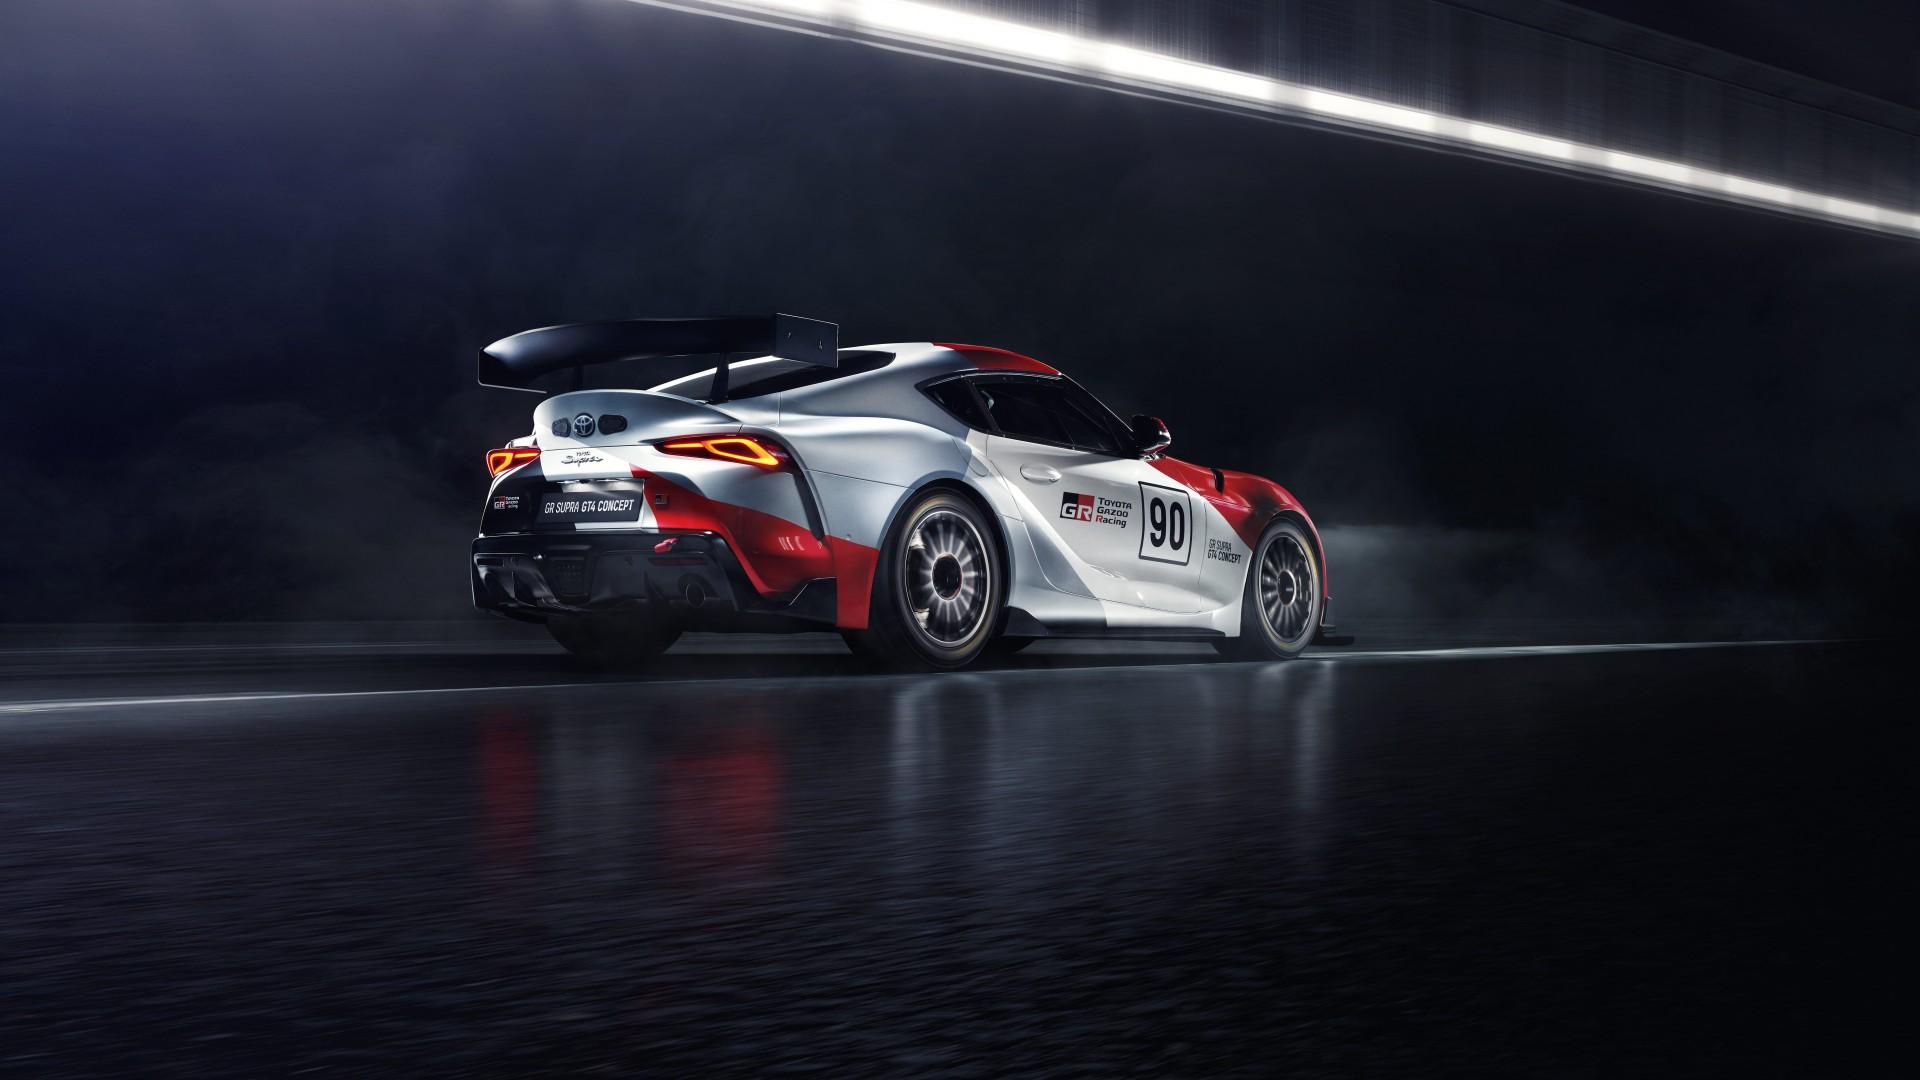 Wallpaper Toyota GR Supra GT4 2019 Cars Geneva Motor Show 2019 1920x1080